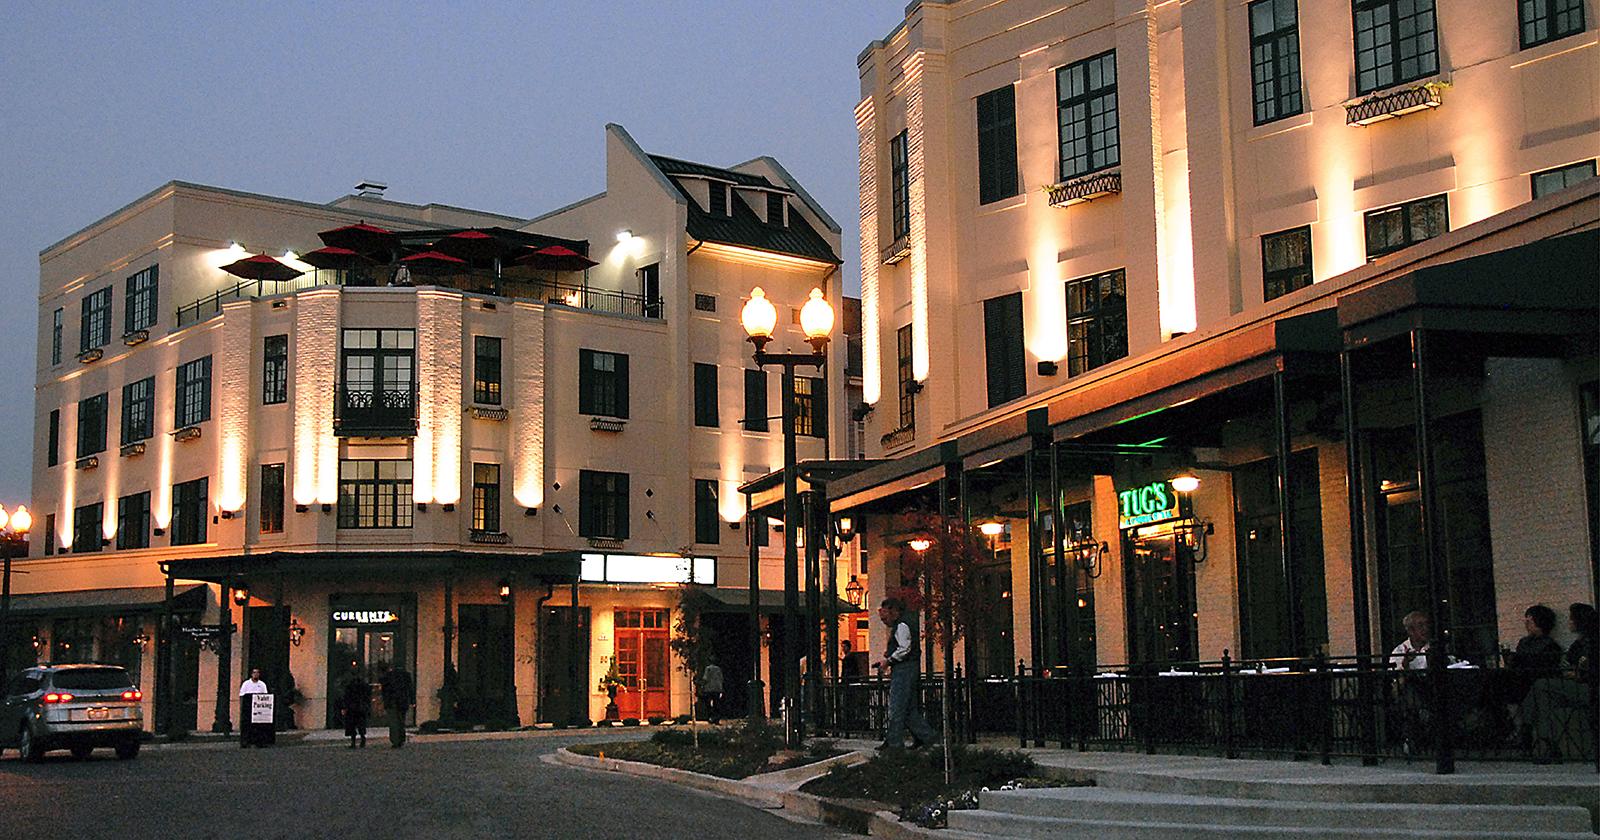 Harbor Town River Inn, Memphis, TN